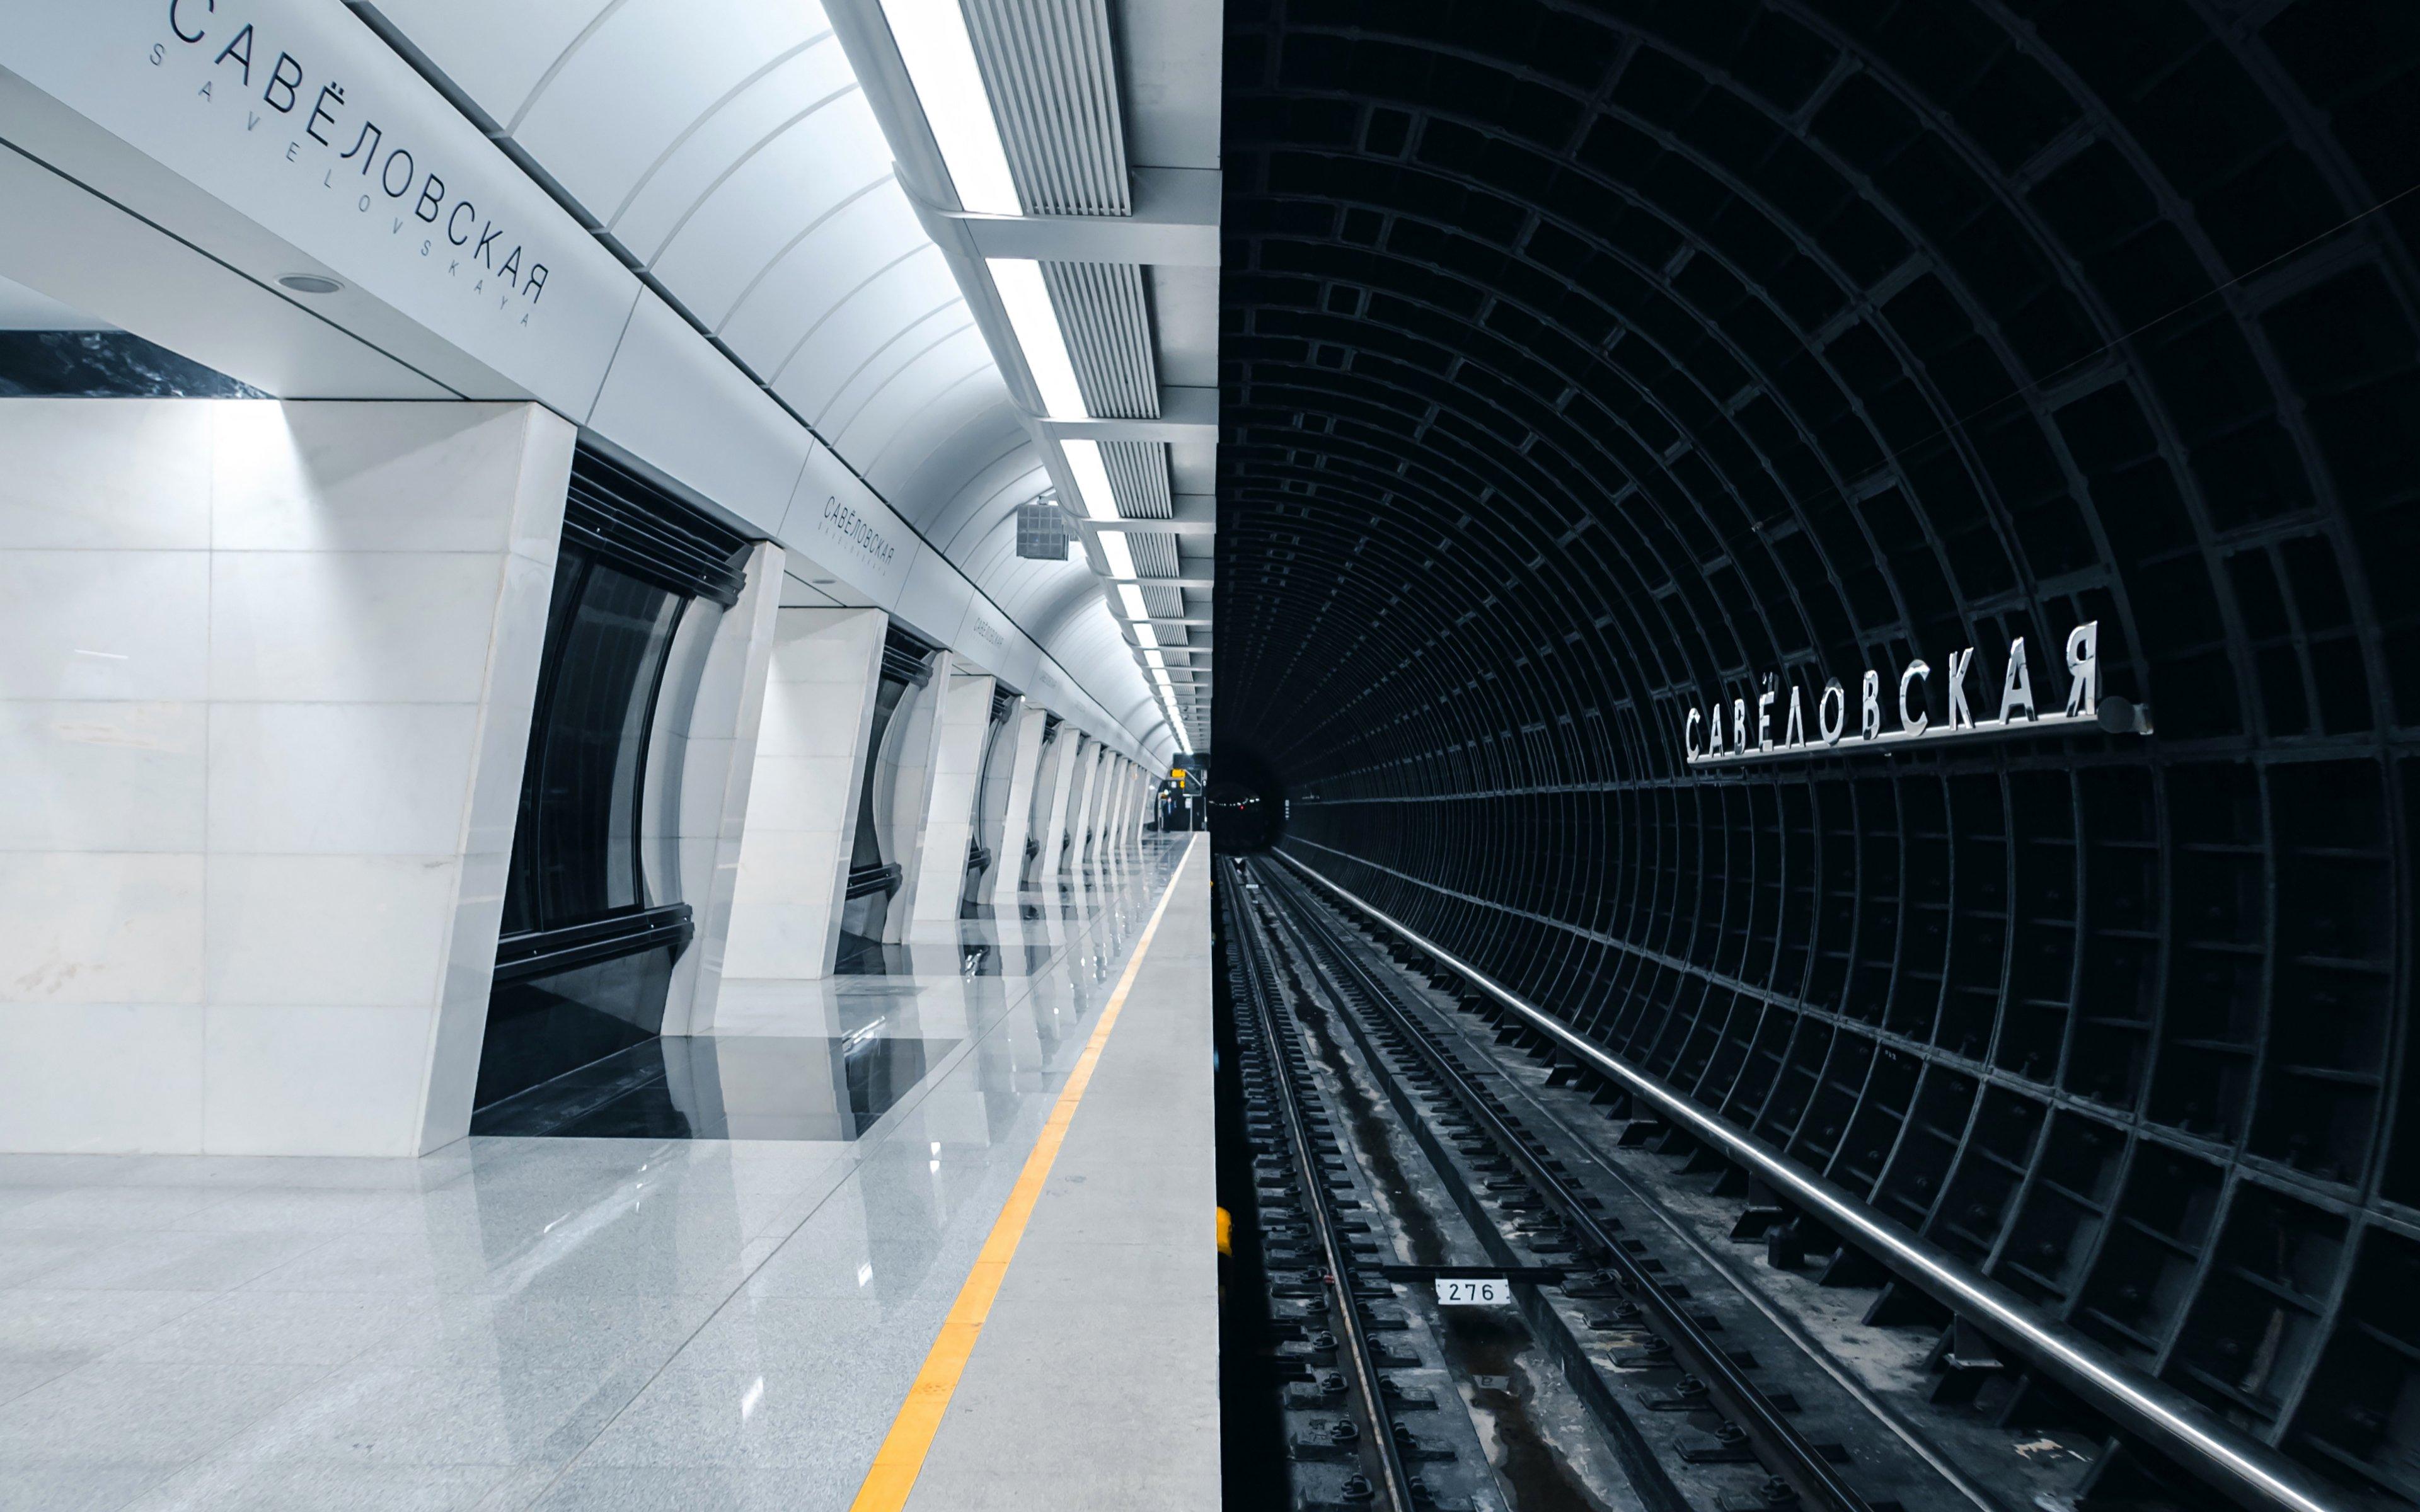 Fondos de pantalla Tunel de estación de metro